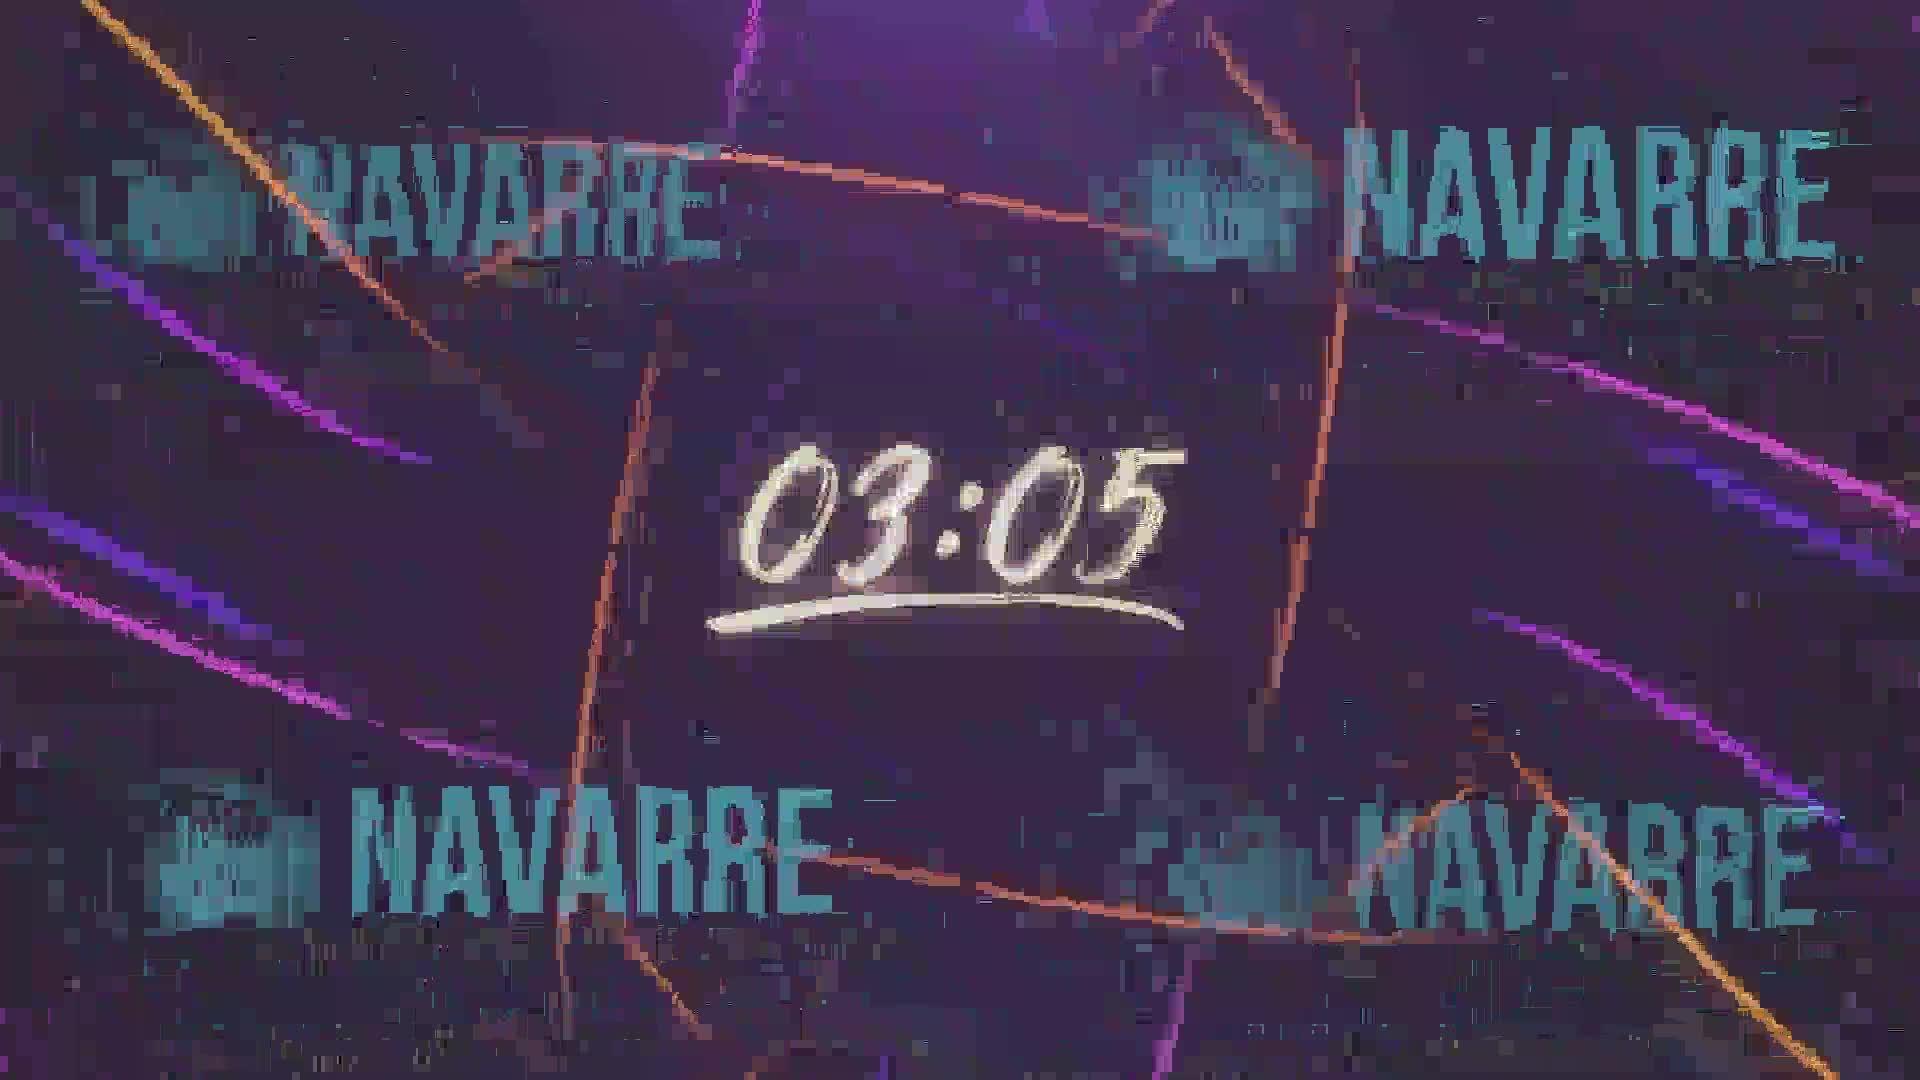 live-recording 4/25/2021 8:53:56 AM